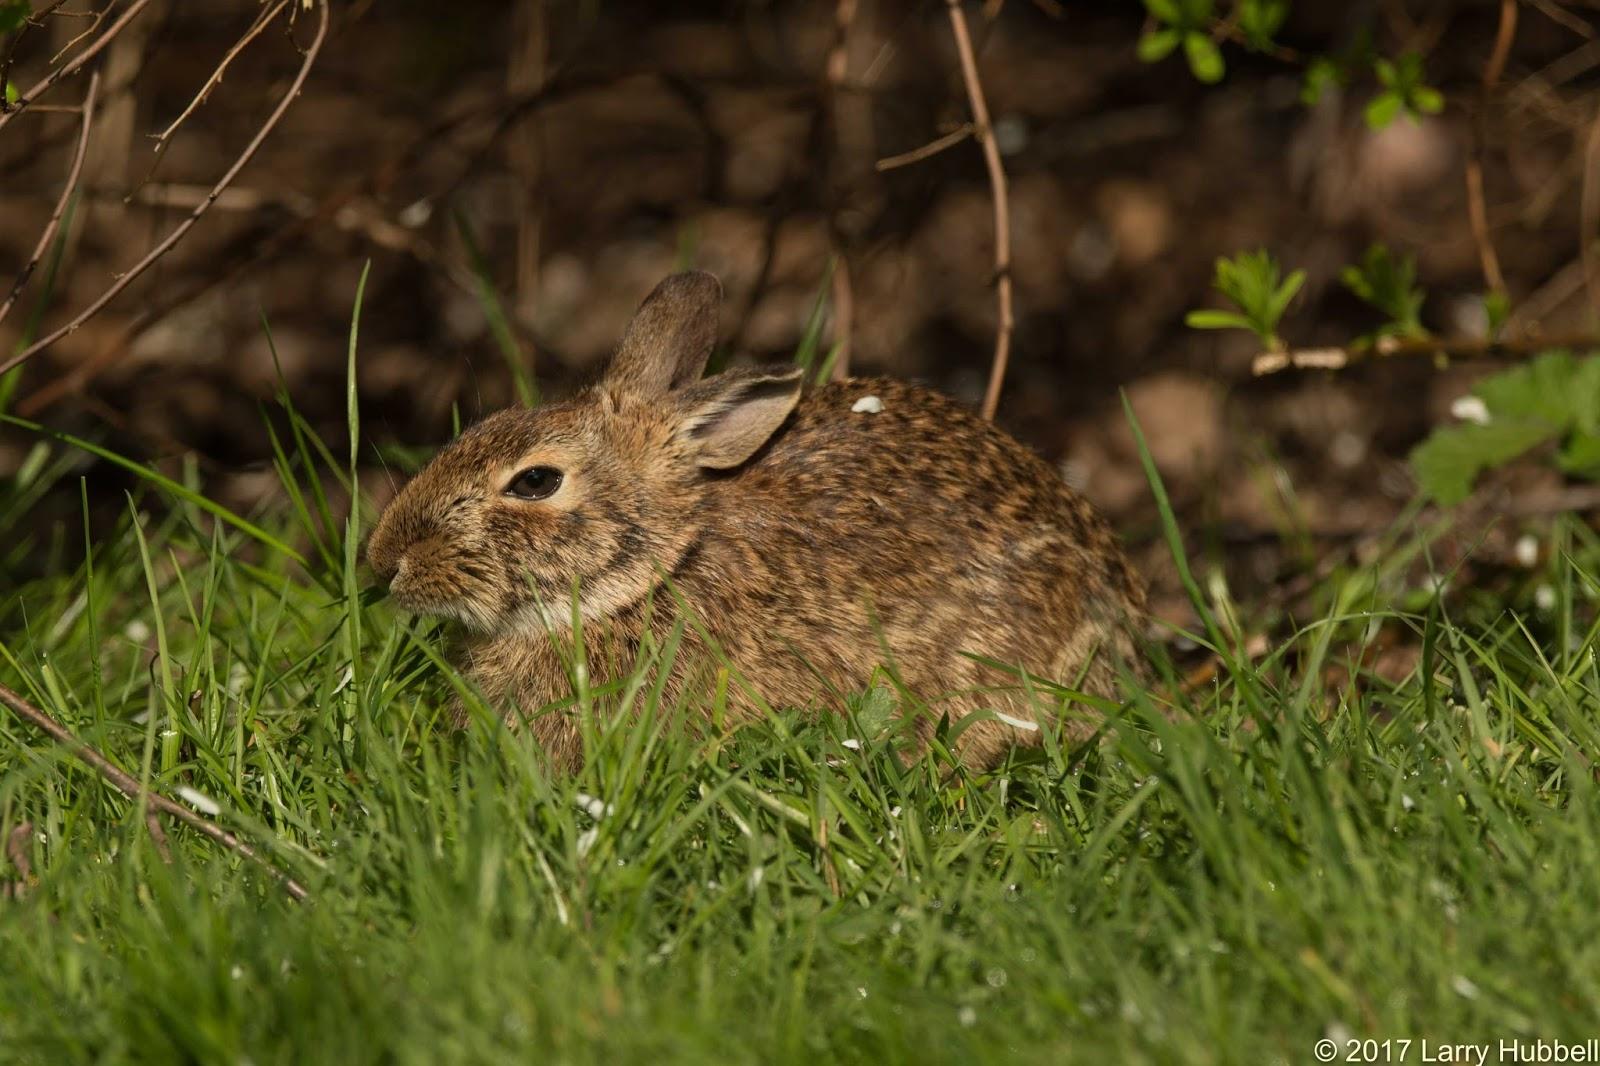 Laurelhurst Blog: Many Rabbit Sightings In Neighborhood And Why So Many?